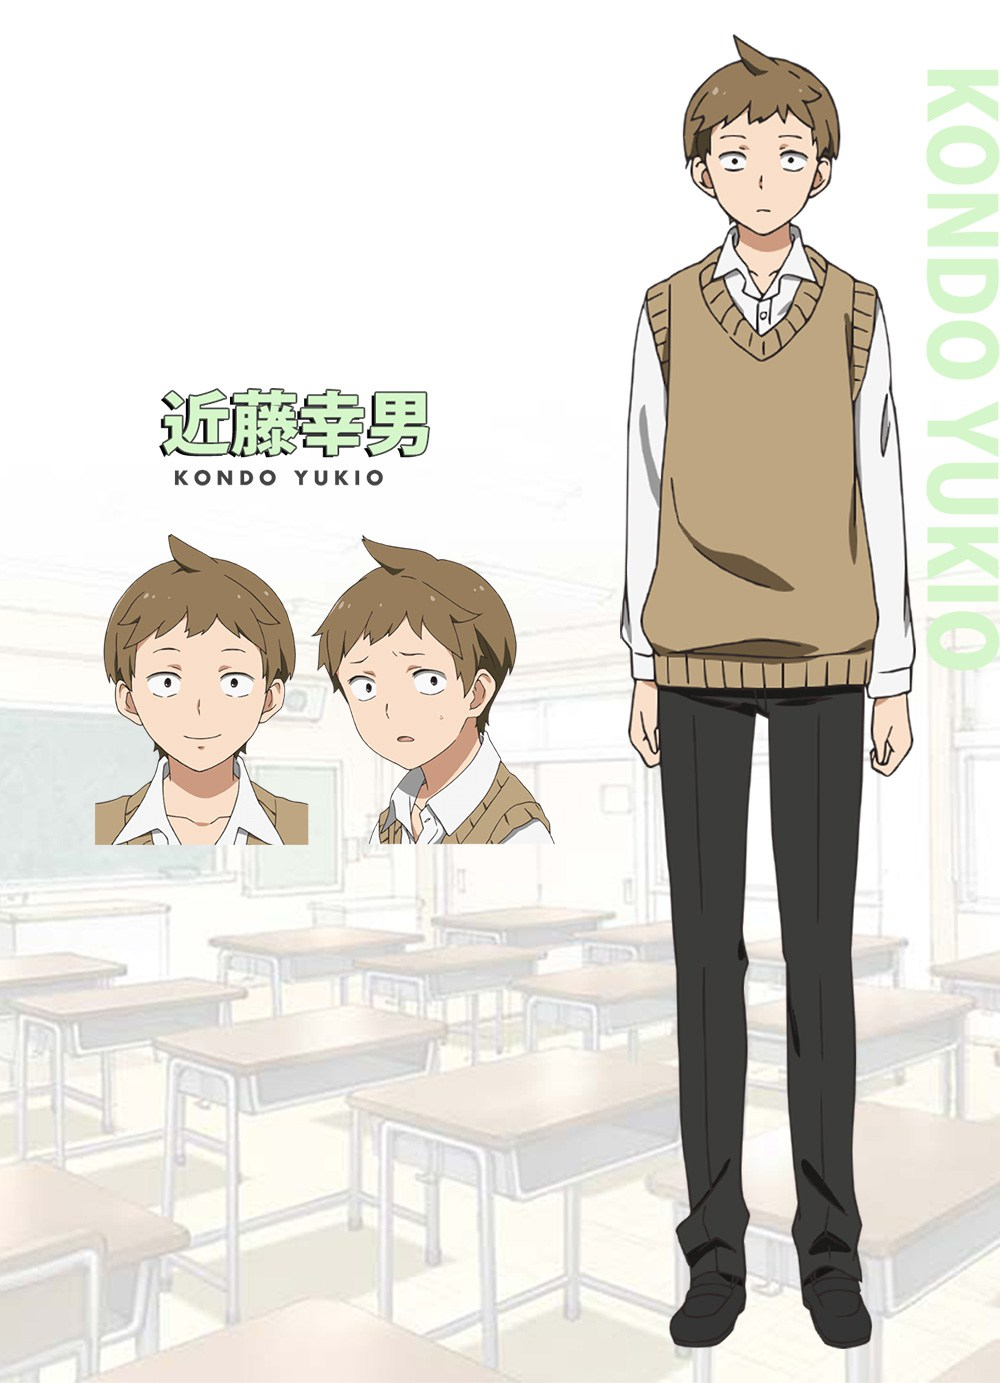 Handa-kun-TV-Anime-Character-Designs-Yukio-Kondo